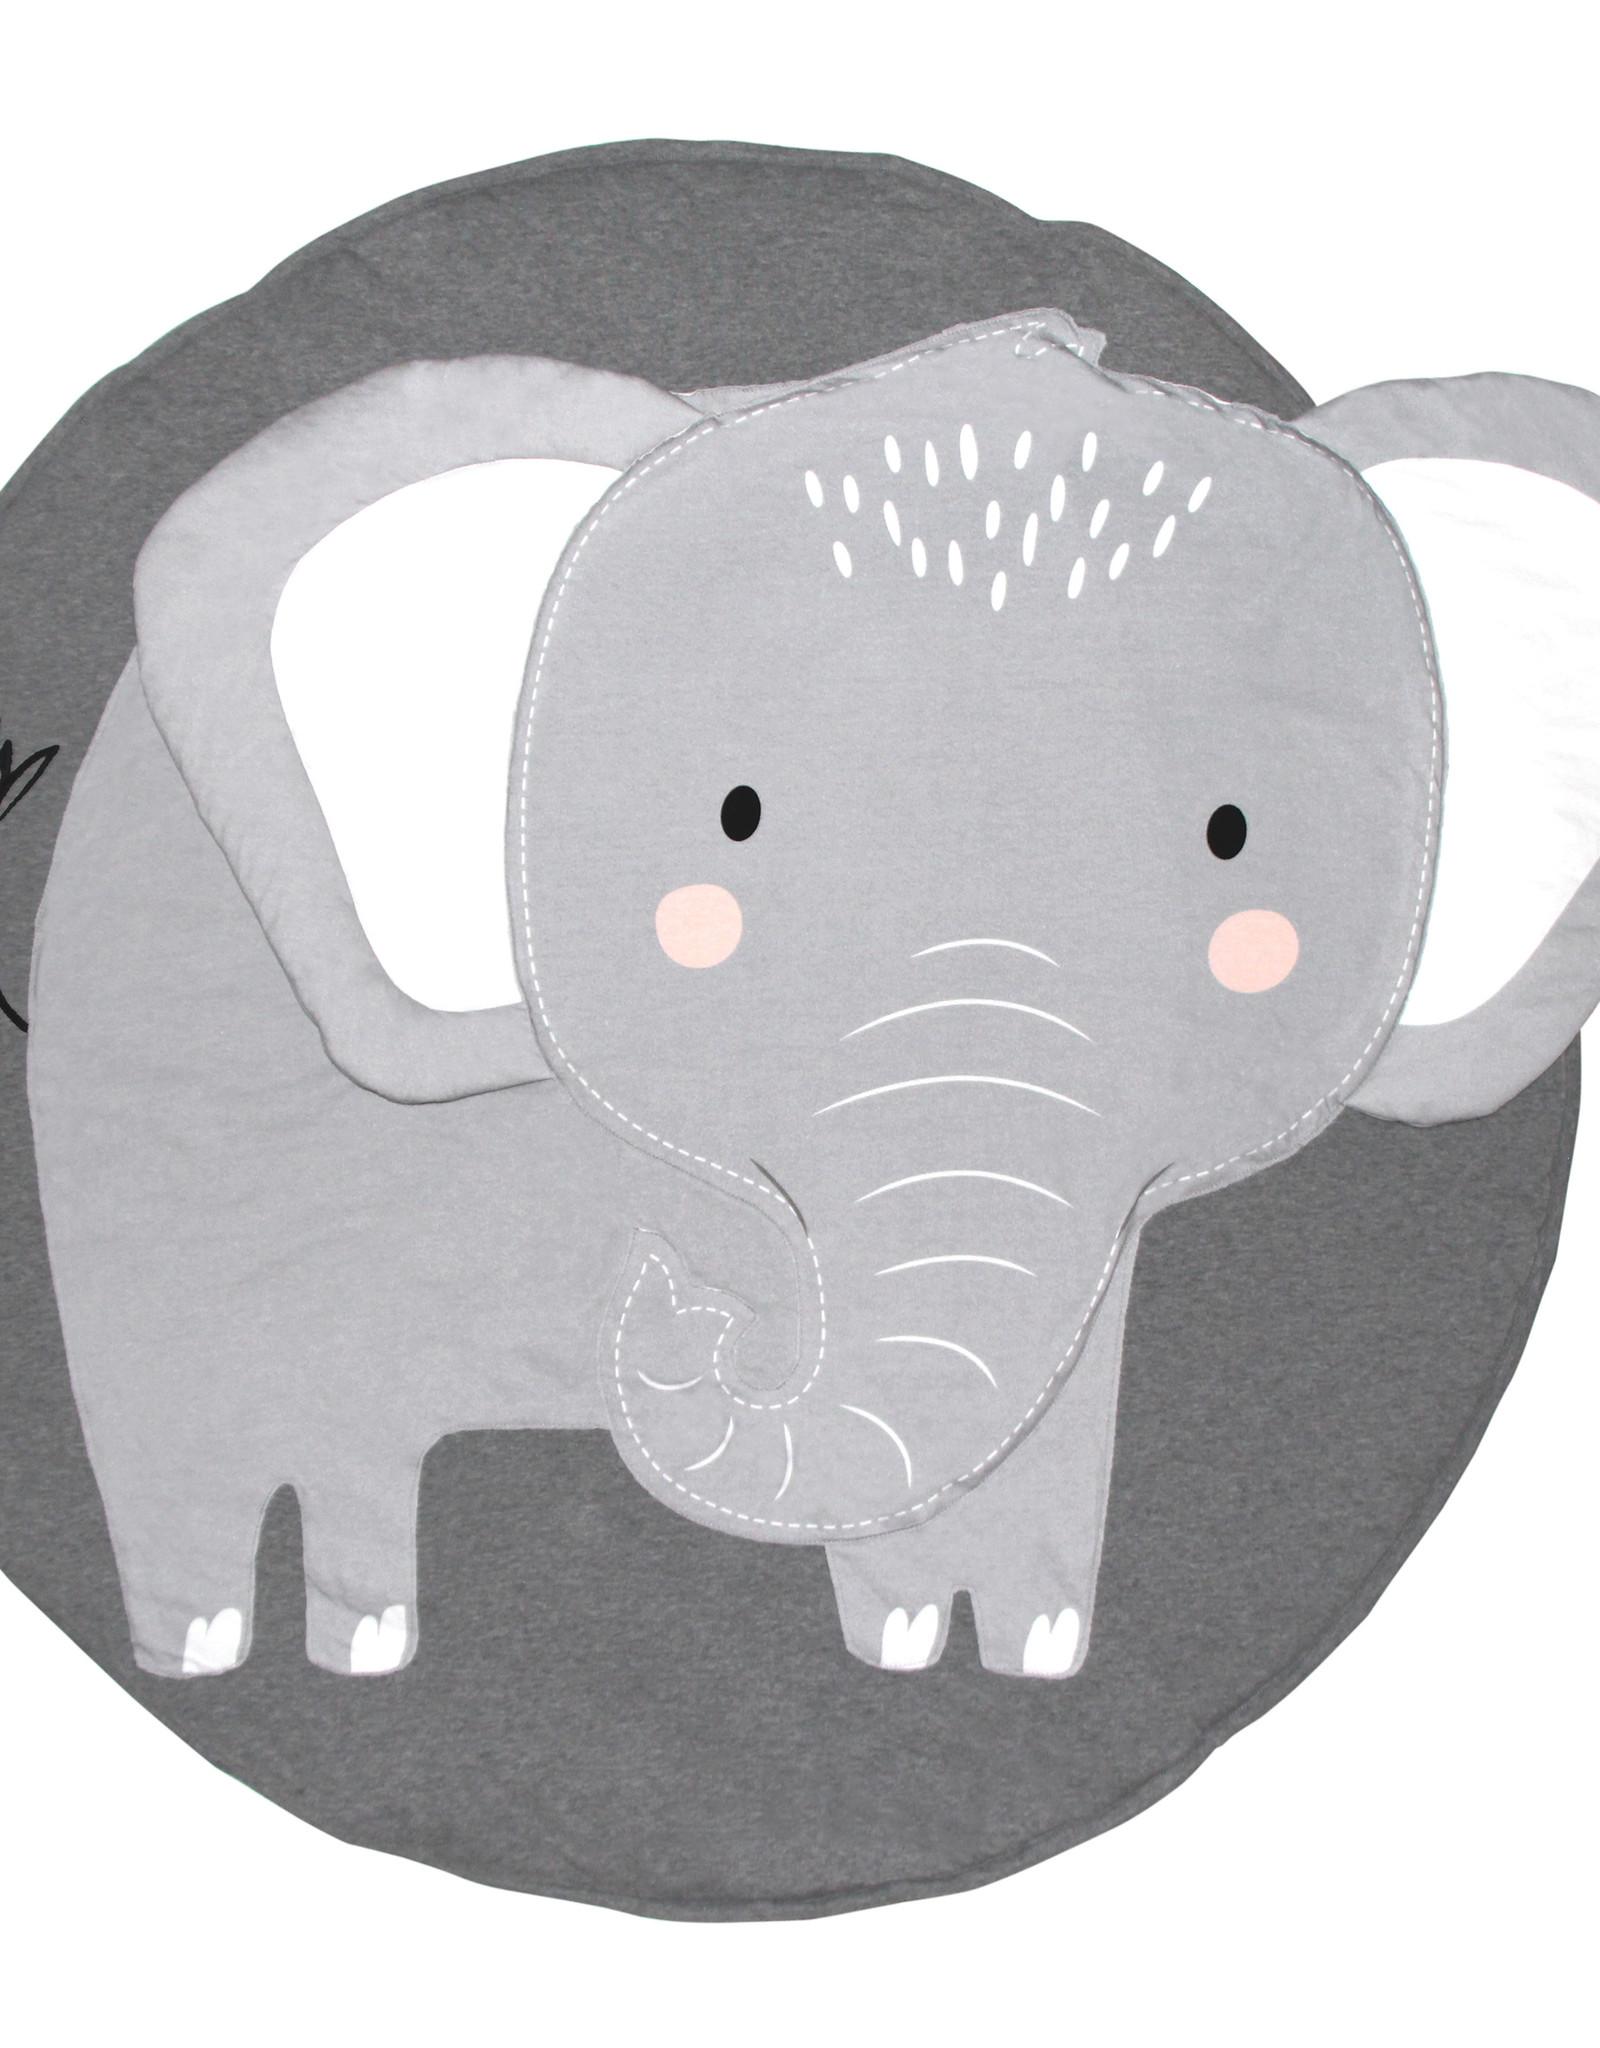 Mister Fly Mister Fly Playmat - Elephant